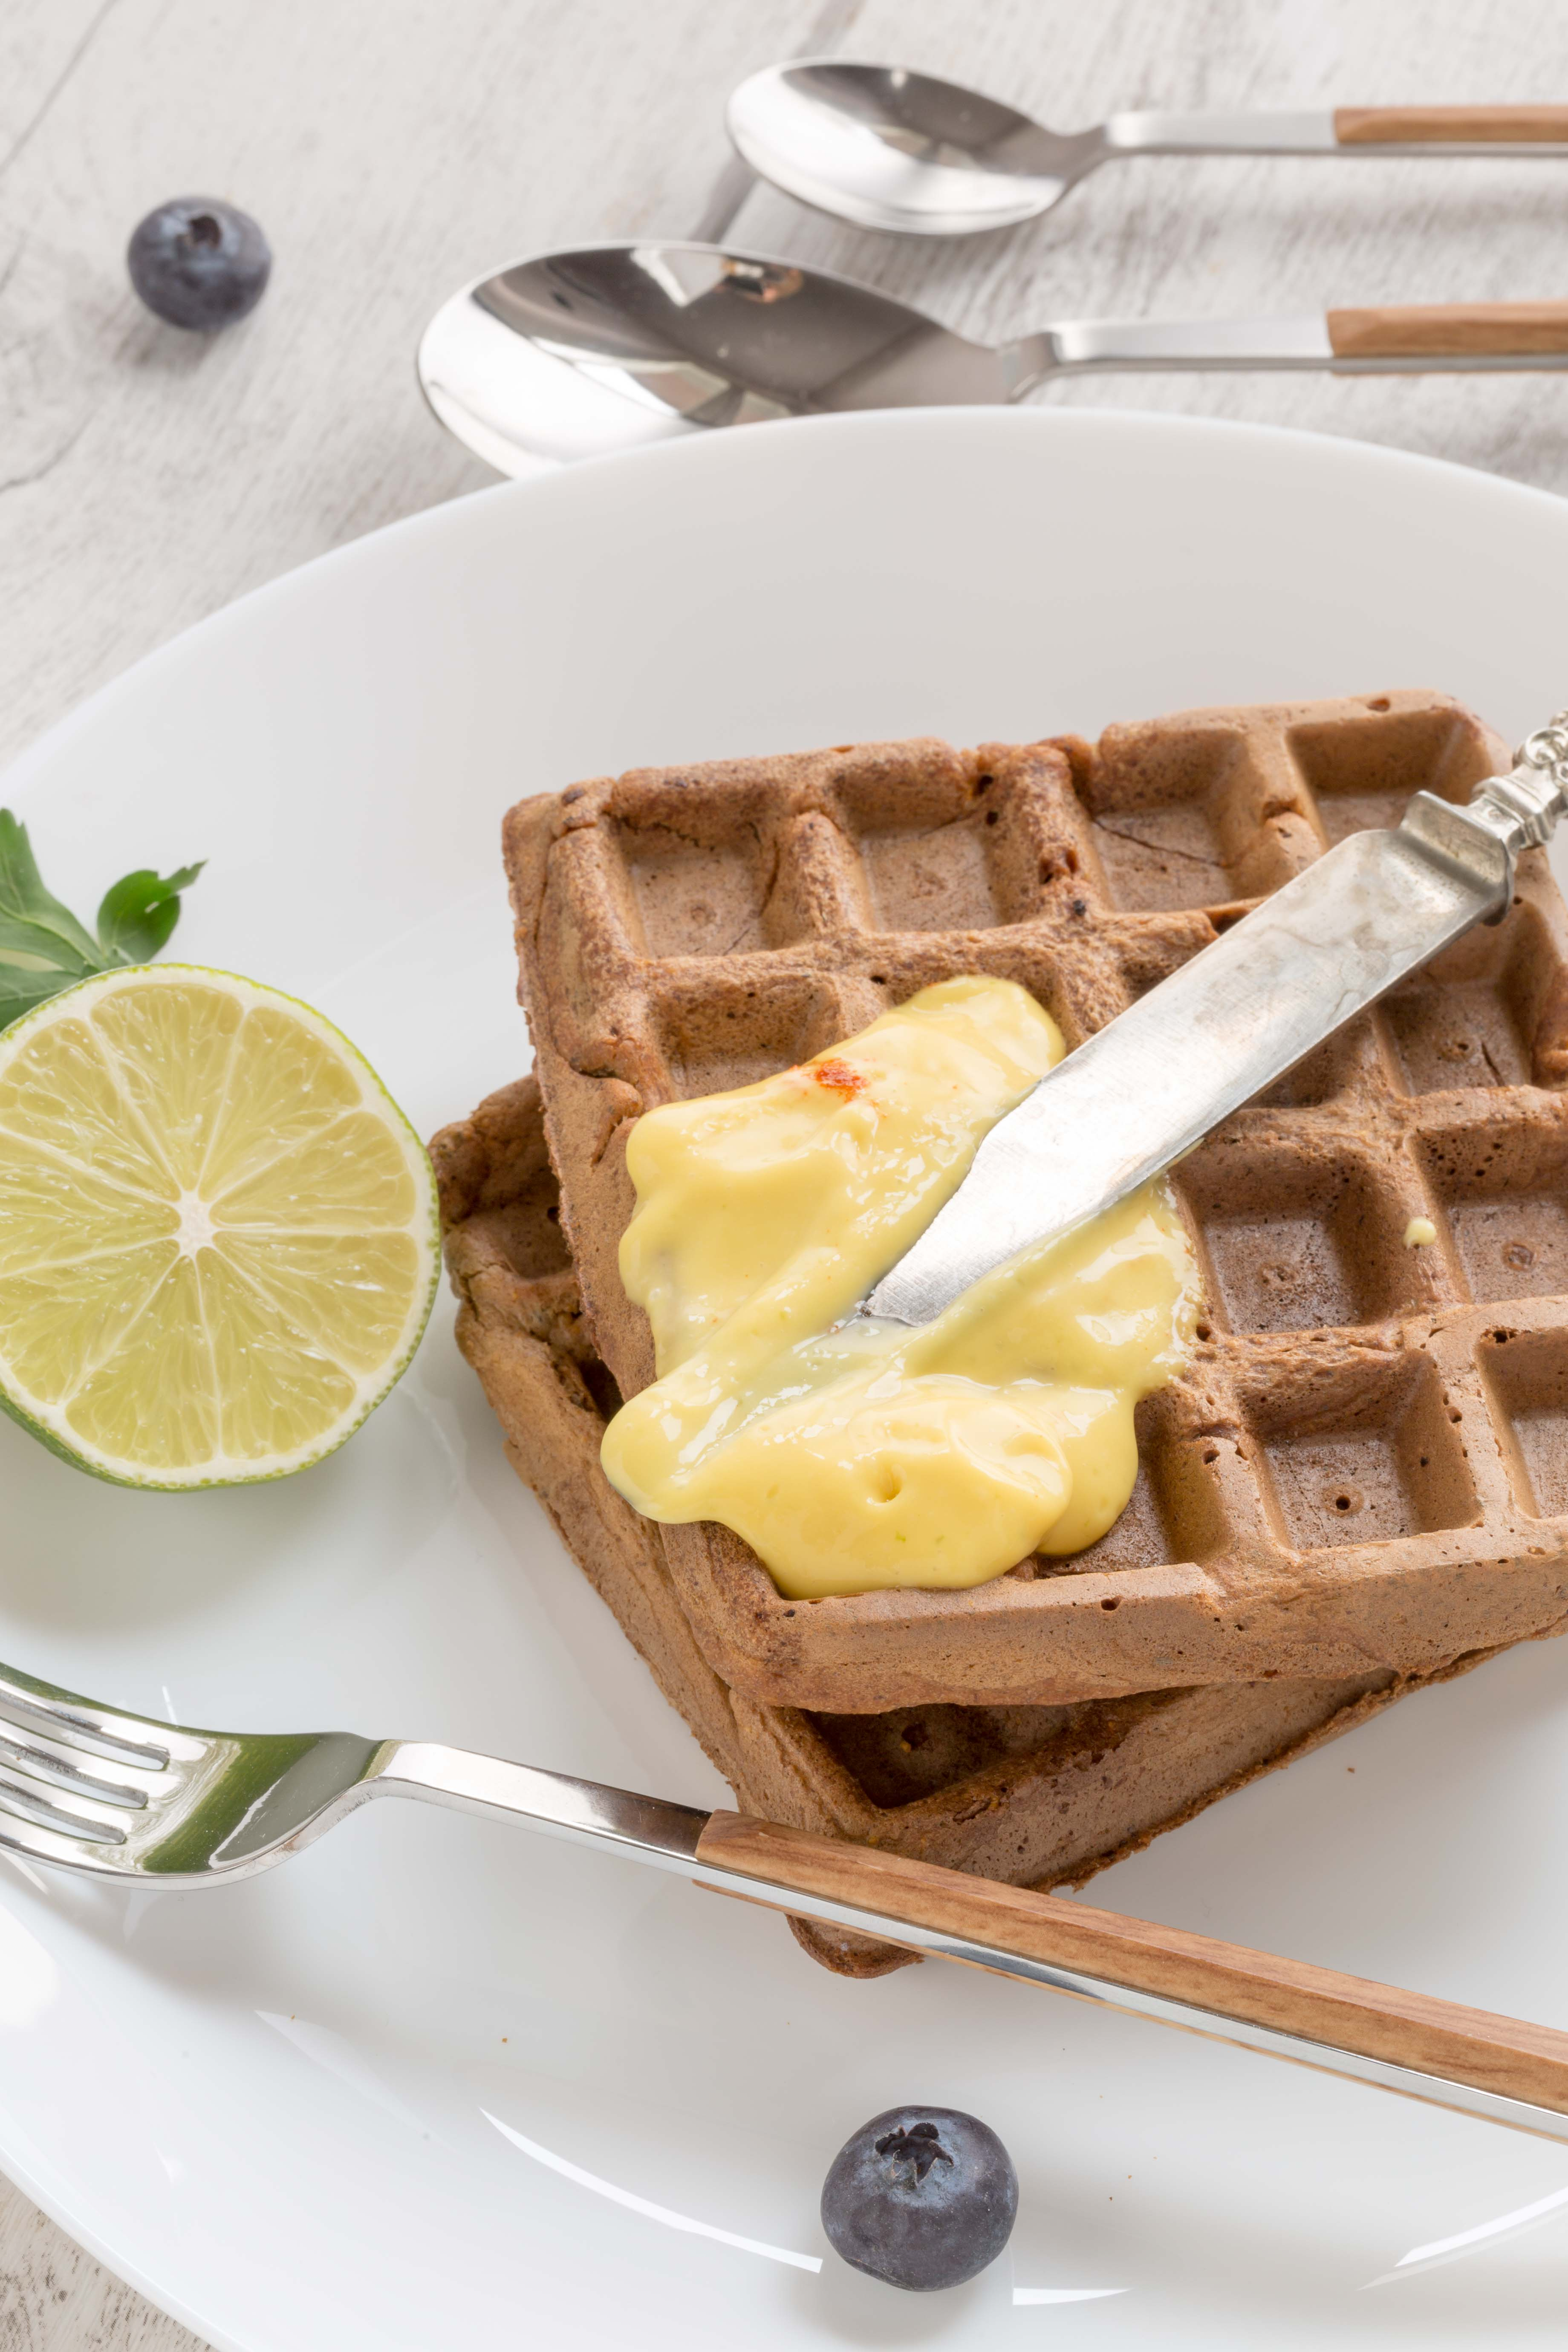 #vegan #glutenfree #mango #waffles sweet and savoiry / 2 types with mango vanilla sauce and mango mayo |waffles integrali mango senza uova con farina di riso